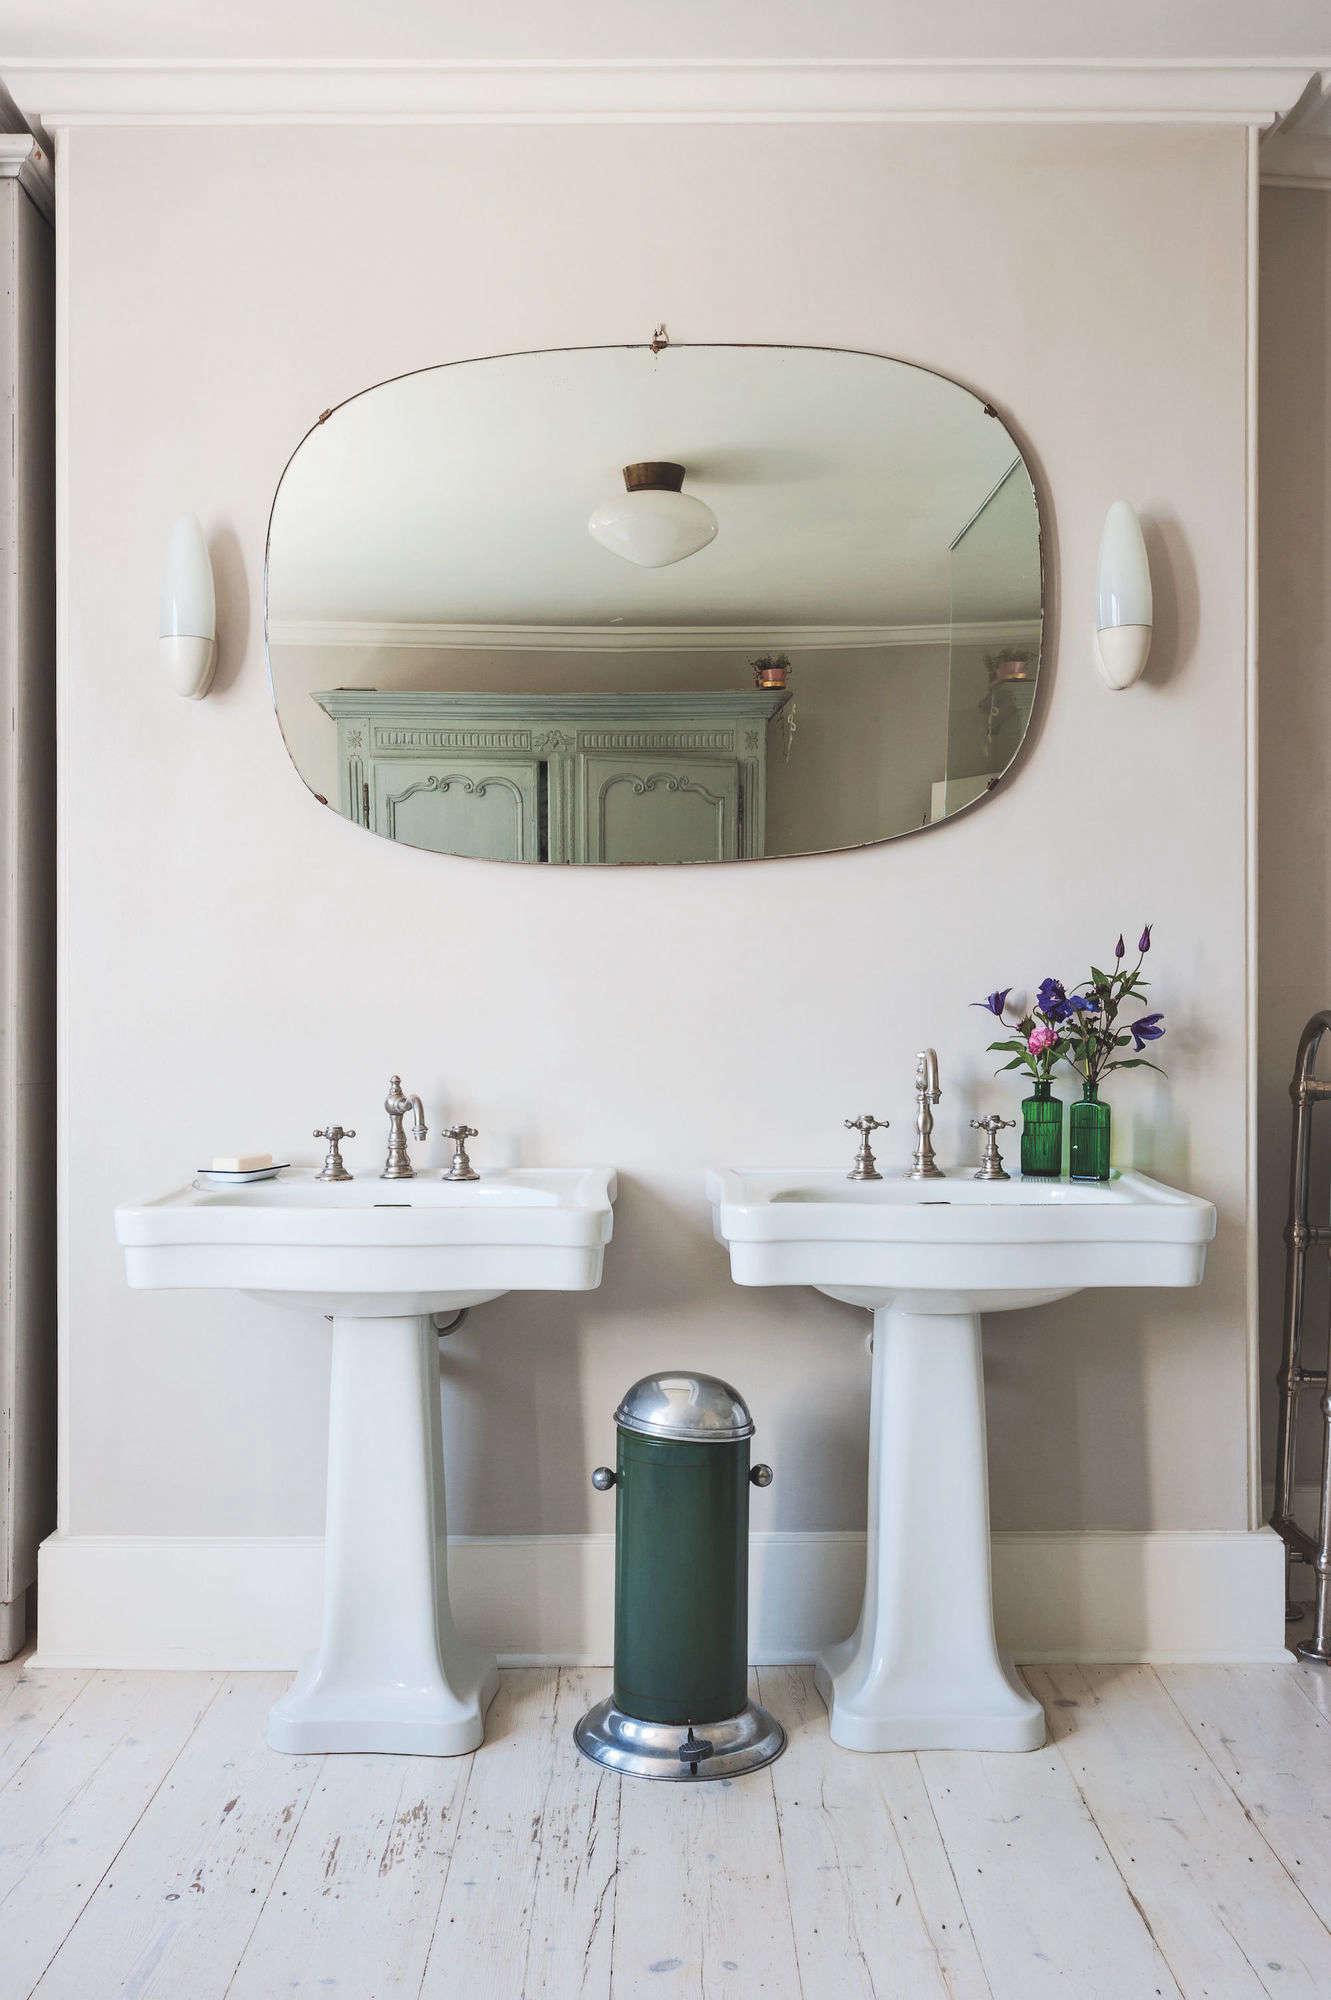 dual pedestal sinks green trash can round mirror bathroom uk